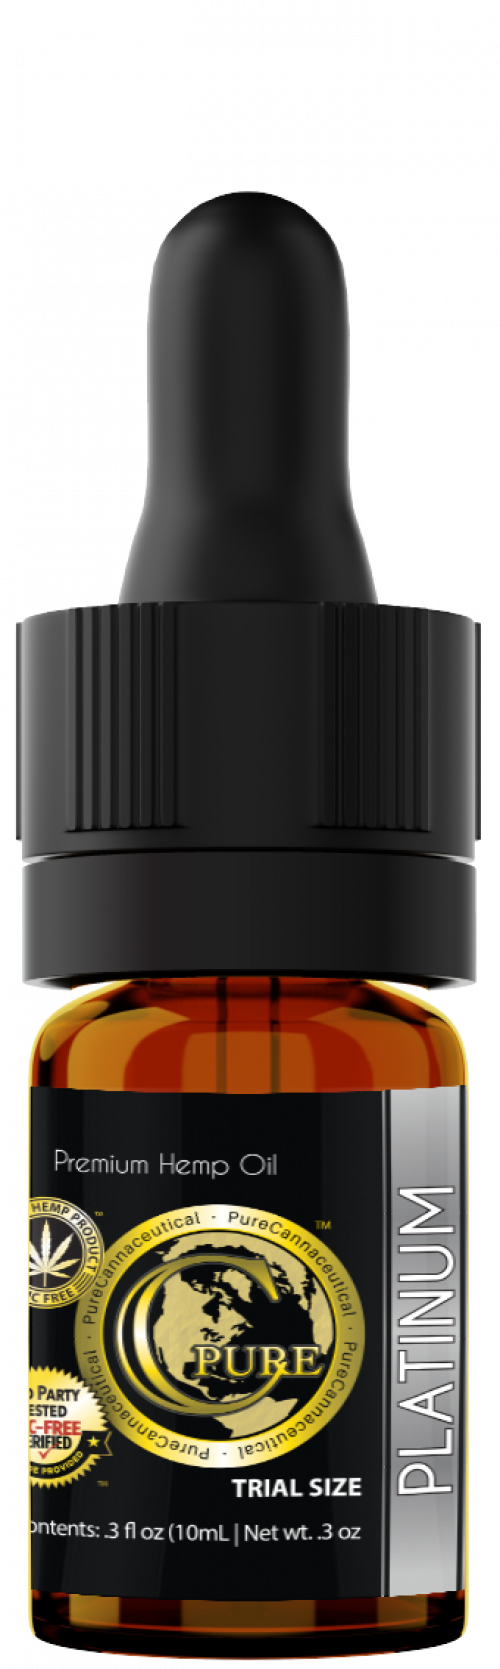 PCRX™ PLATINUM Hemp Oil Tincture, 10mL 10mg/mL, Trial Size